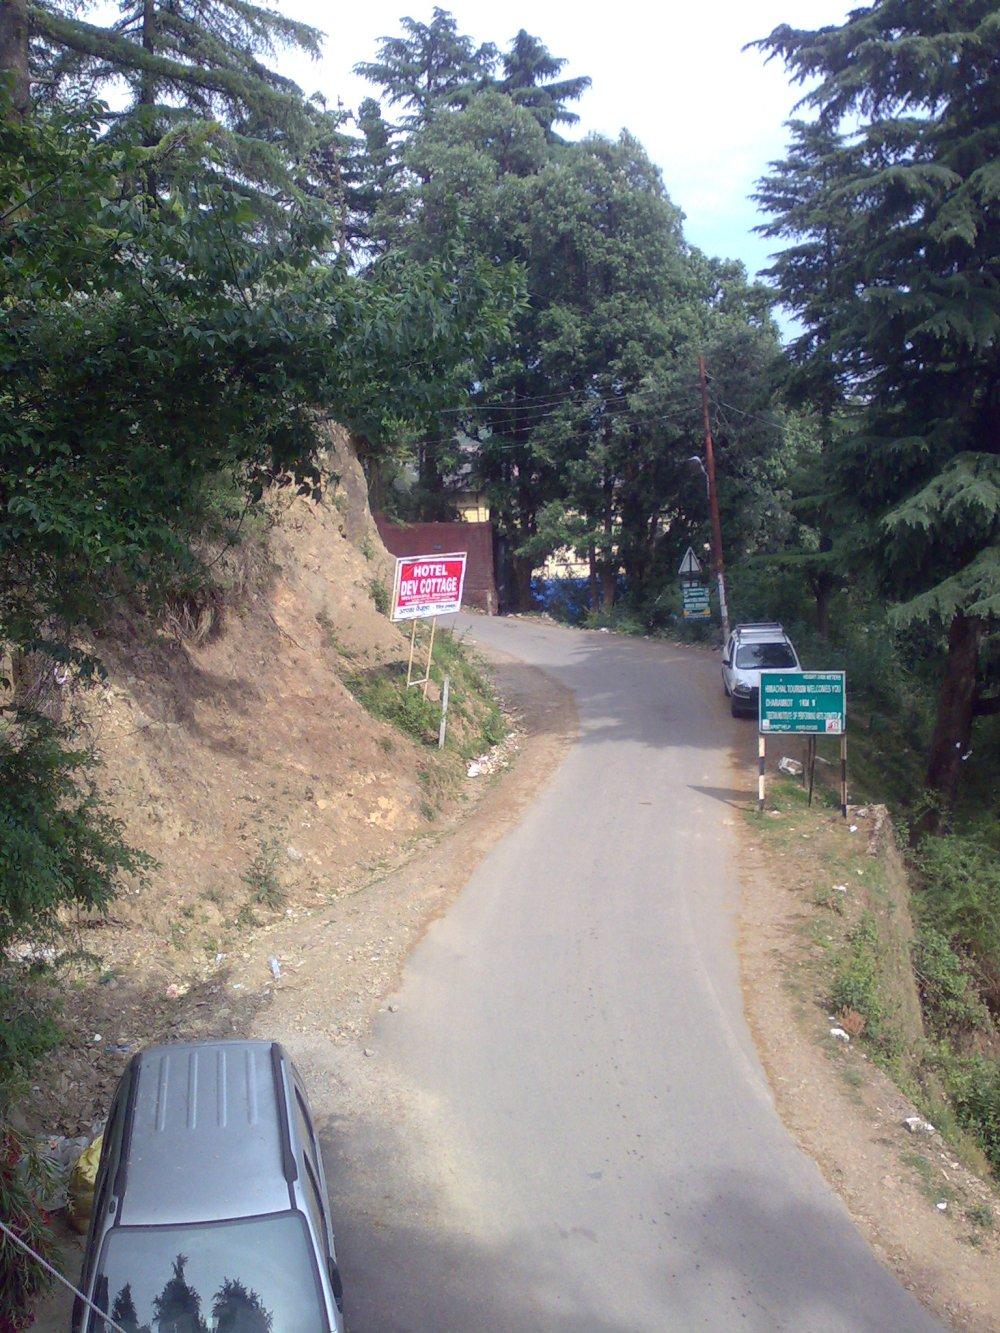 The winding roads, Macleodgang, Himachal Pradesh, India